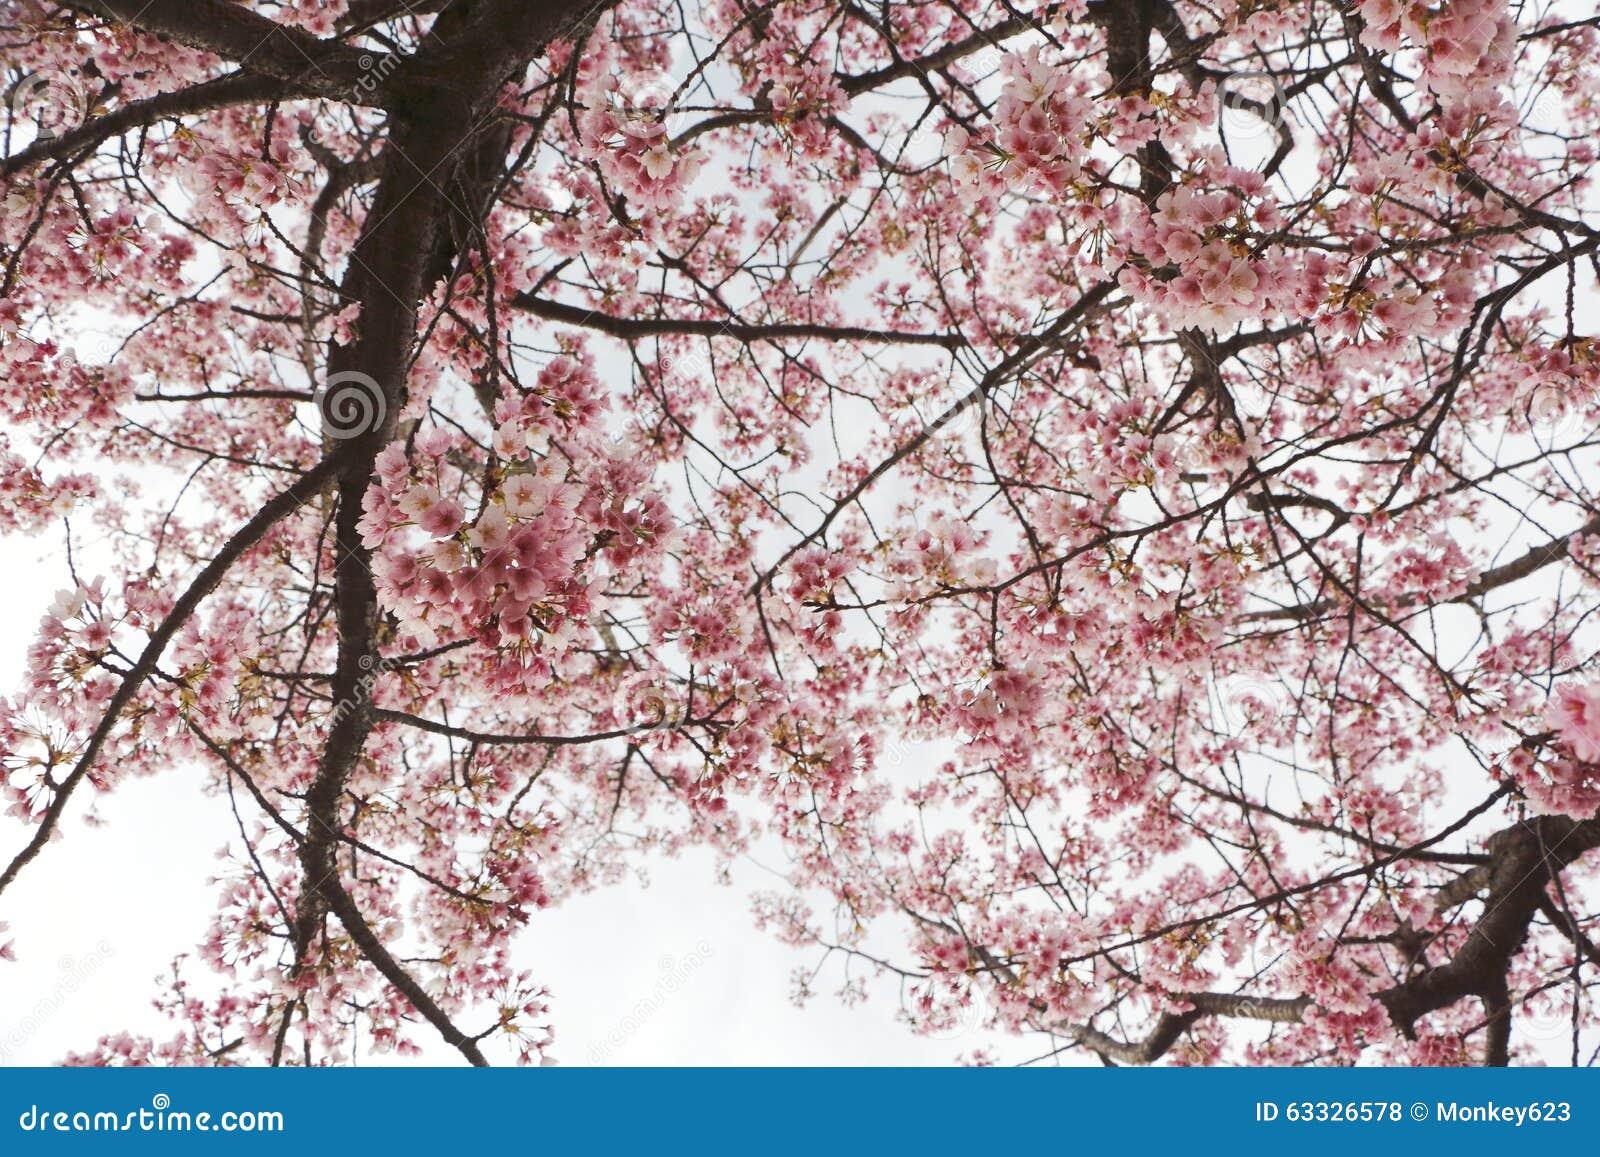 Japan Sakura Stock Photo Image Of Symbolize Culture 63326578